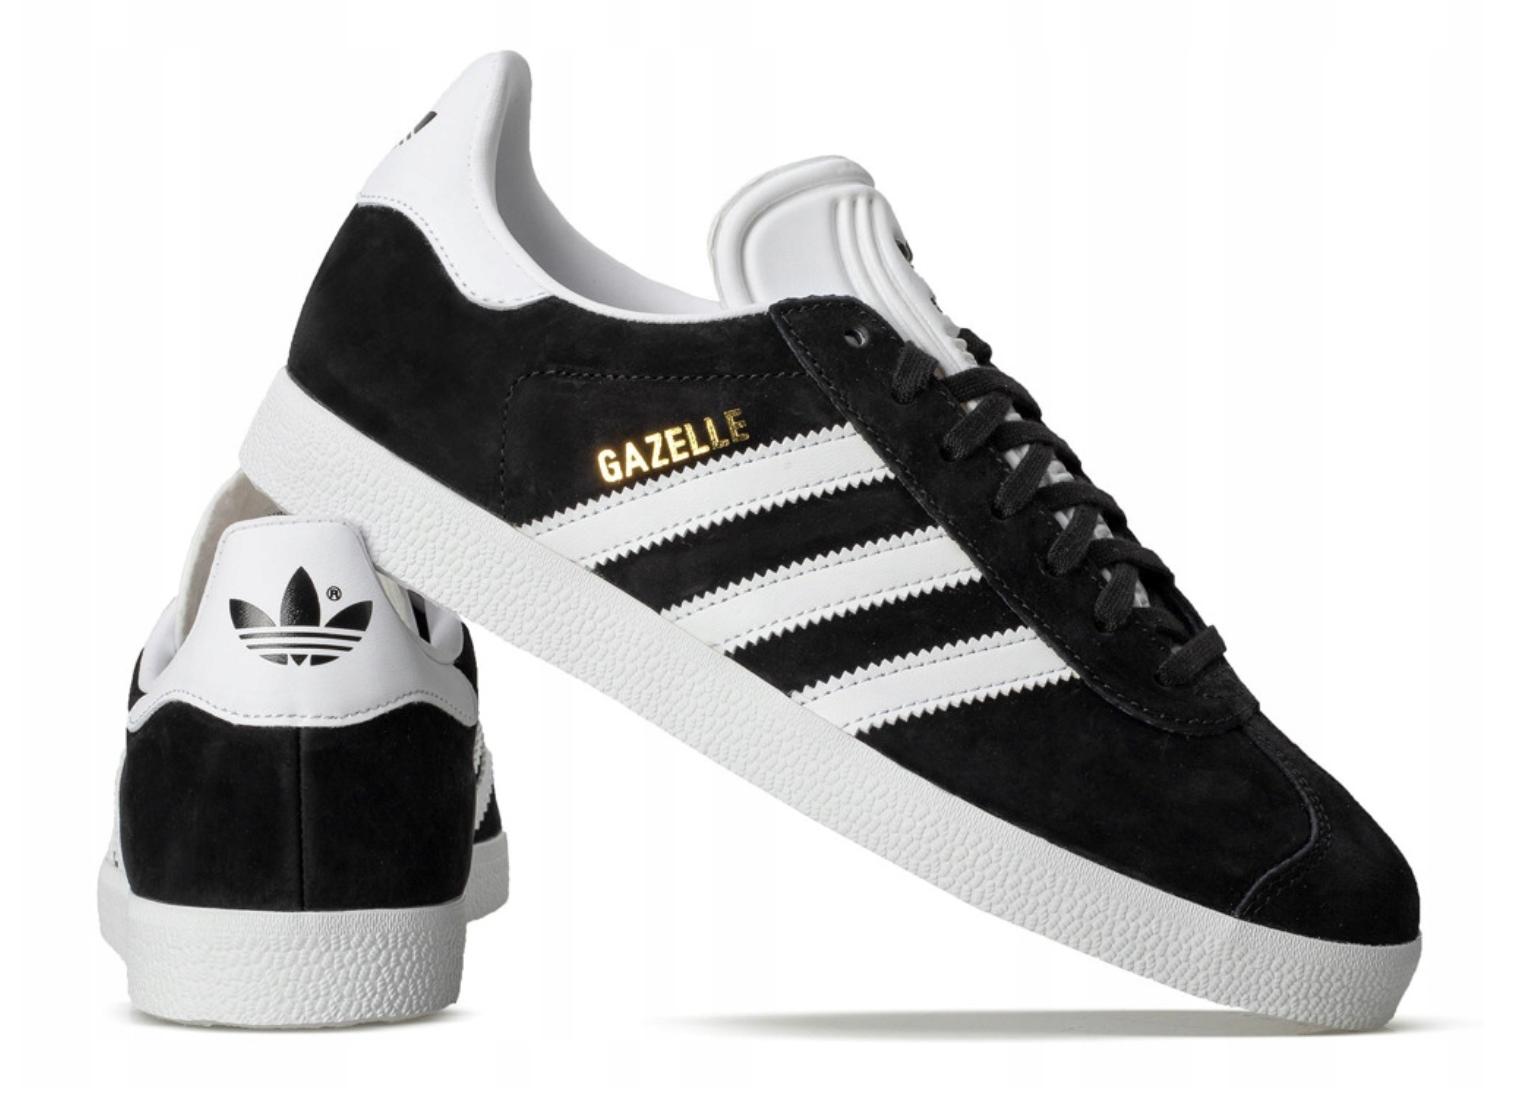 Adidas Gazelle Bb5476 Sportowe Buty Meskie Czarne 8145322055 Oficjalne Archiwum Allegro Adidas Gazelle Mens Adidas Superstar Sneaker Adidas